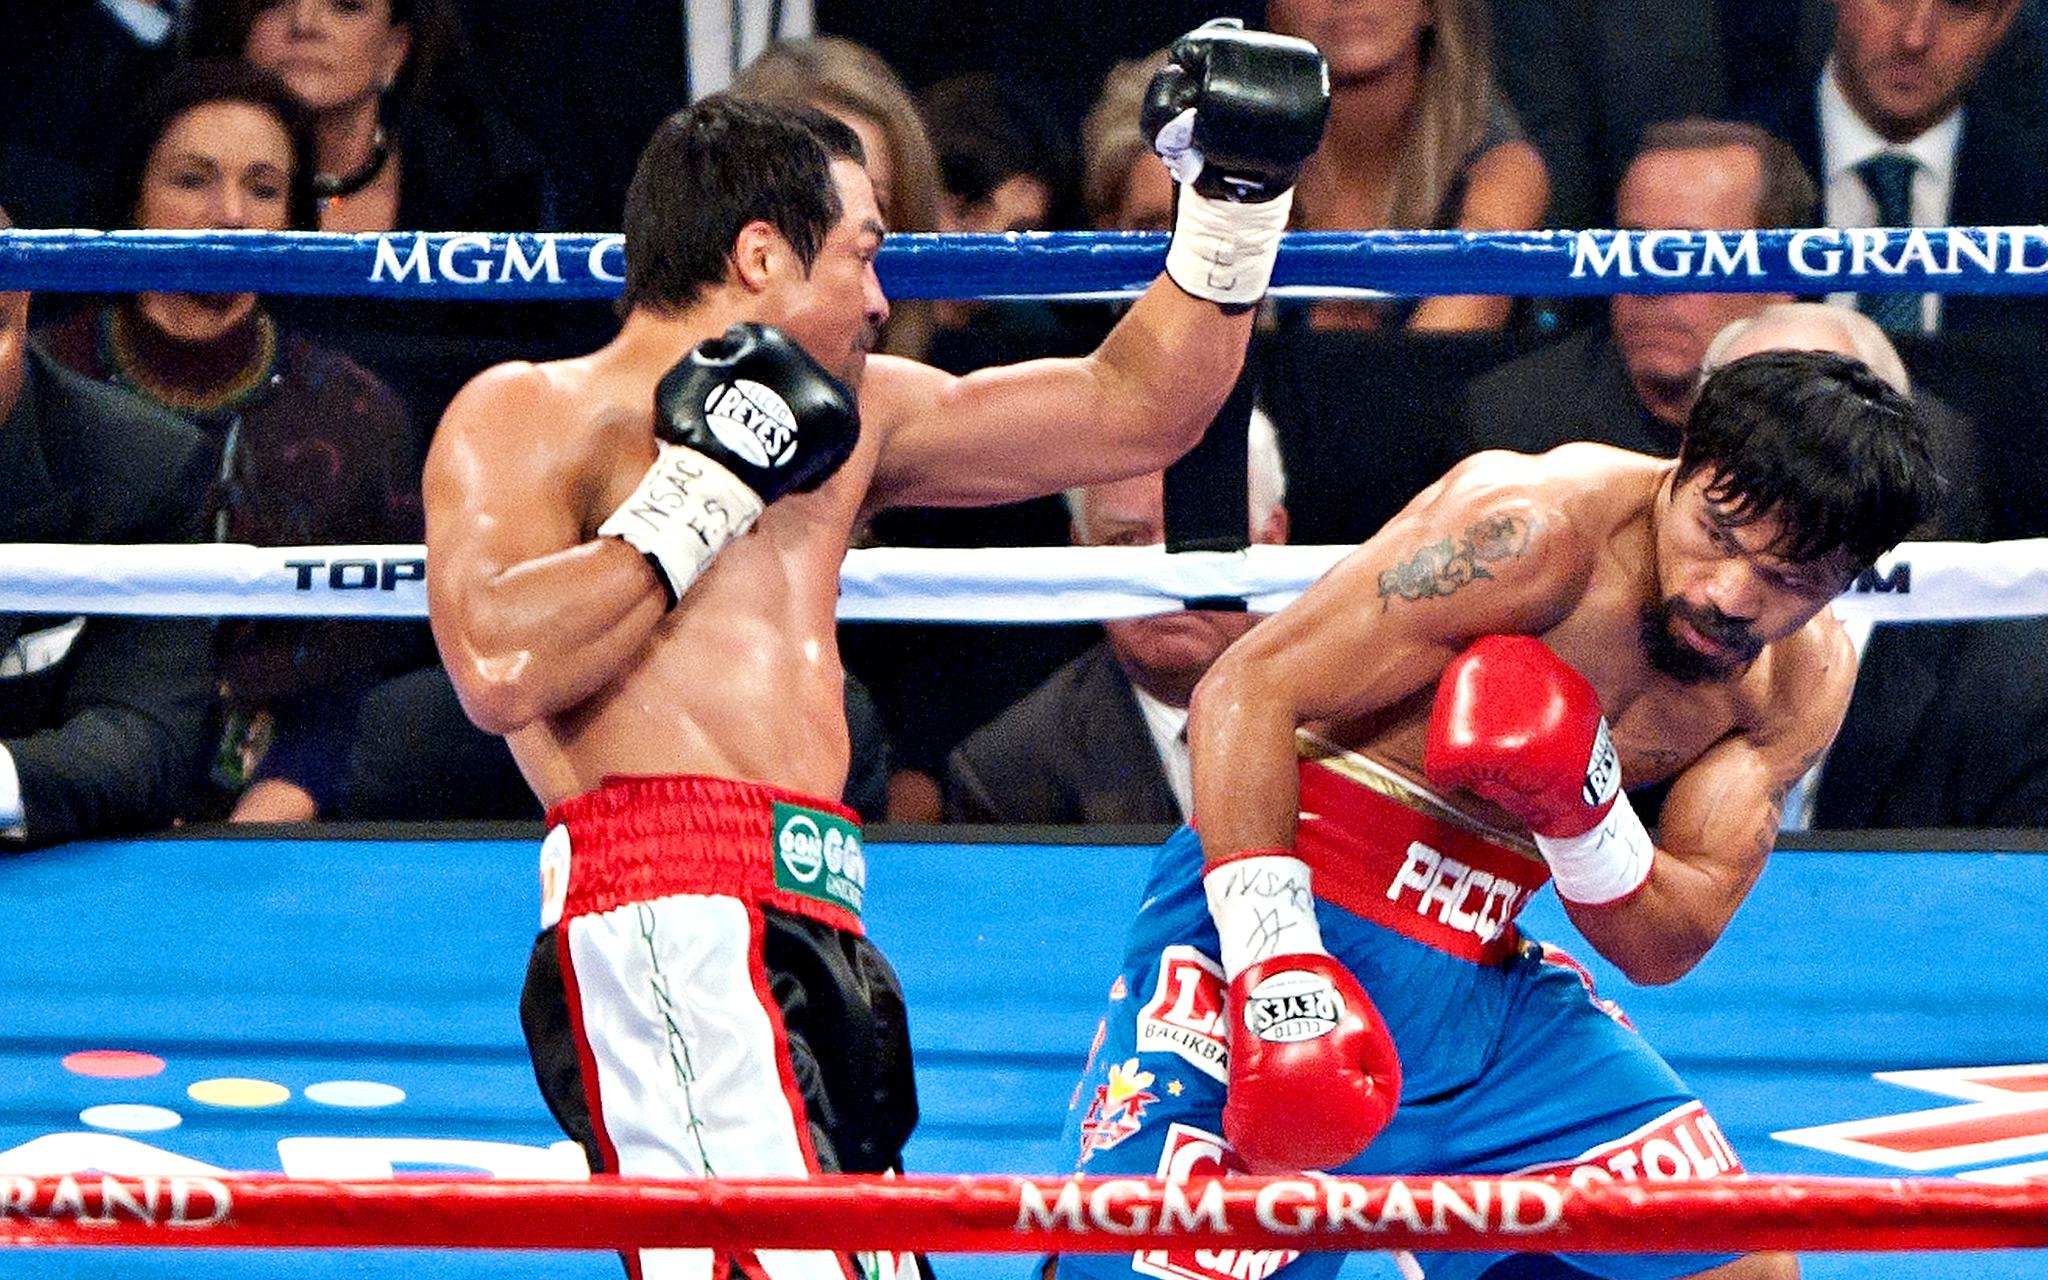 Pacquiao vs. Marquez III